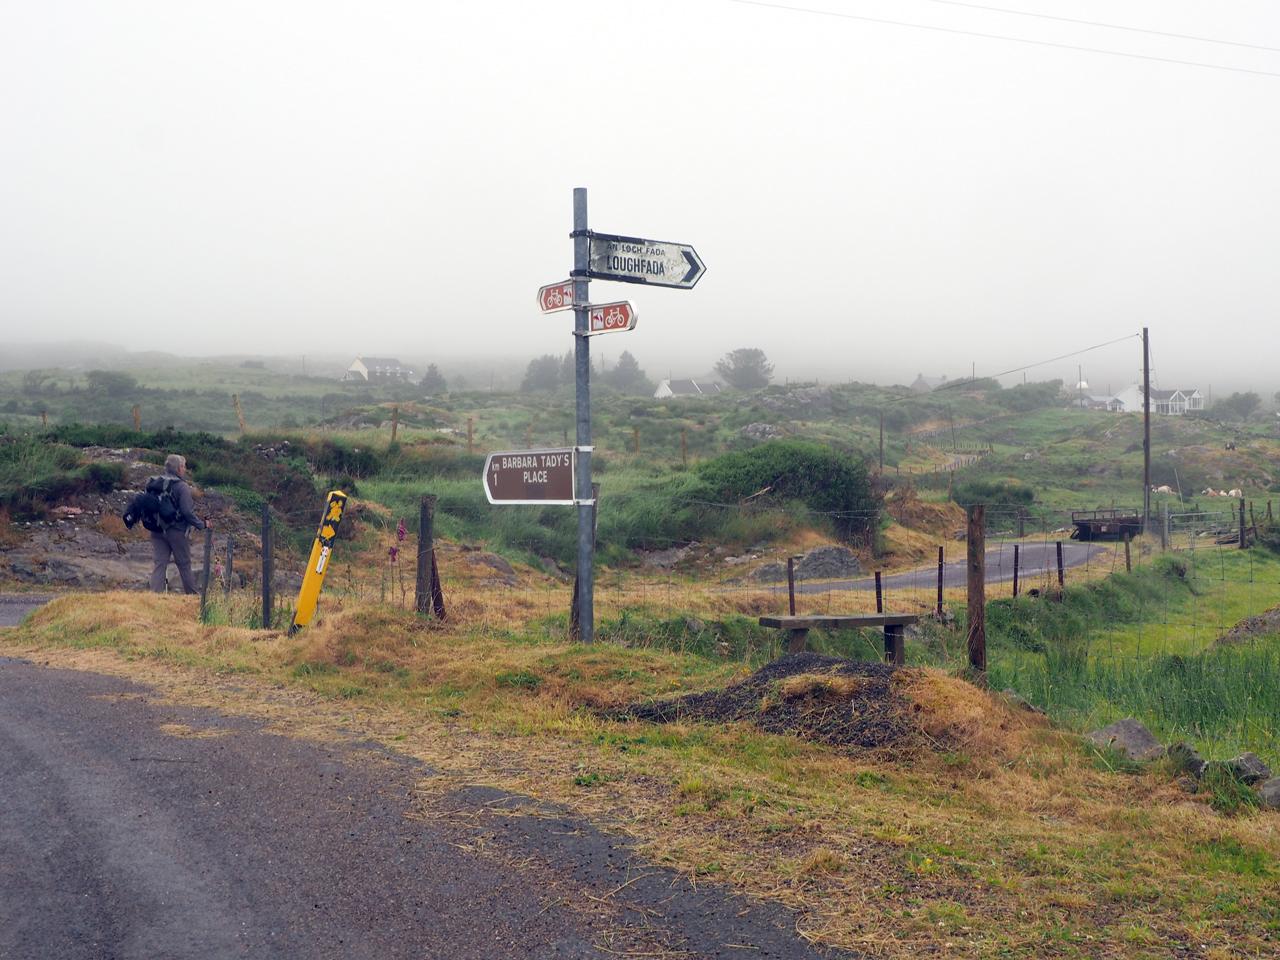 afslag richting Lough Fada